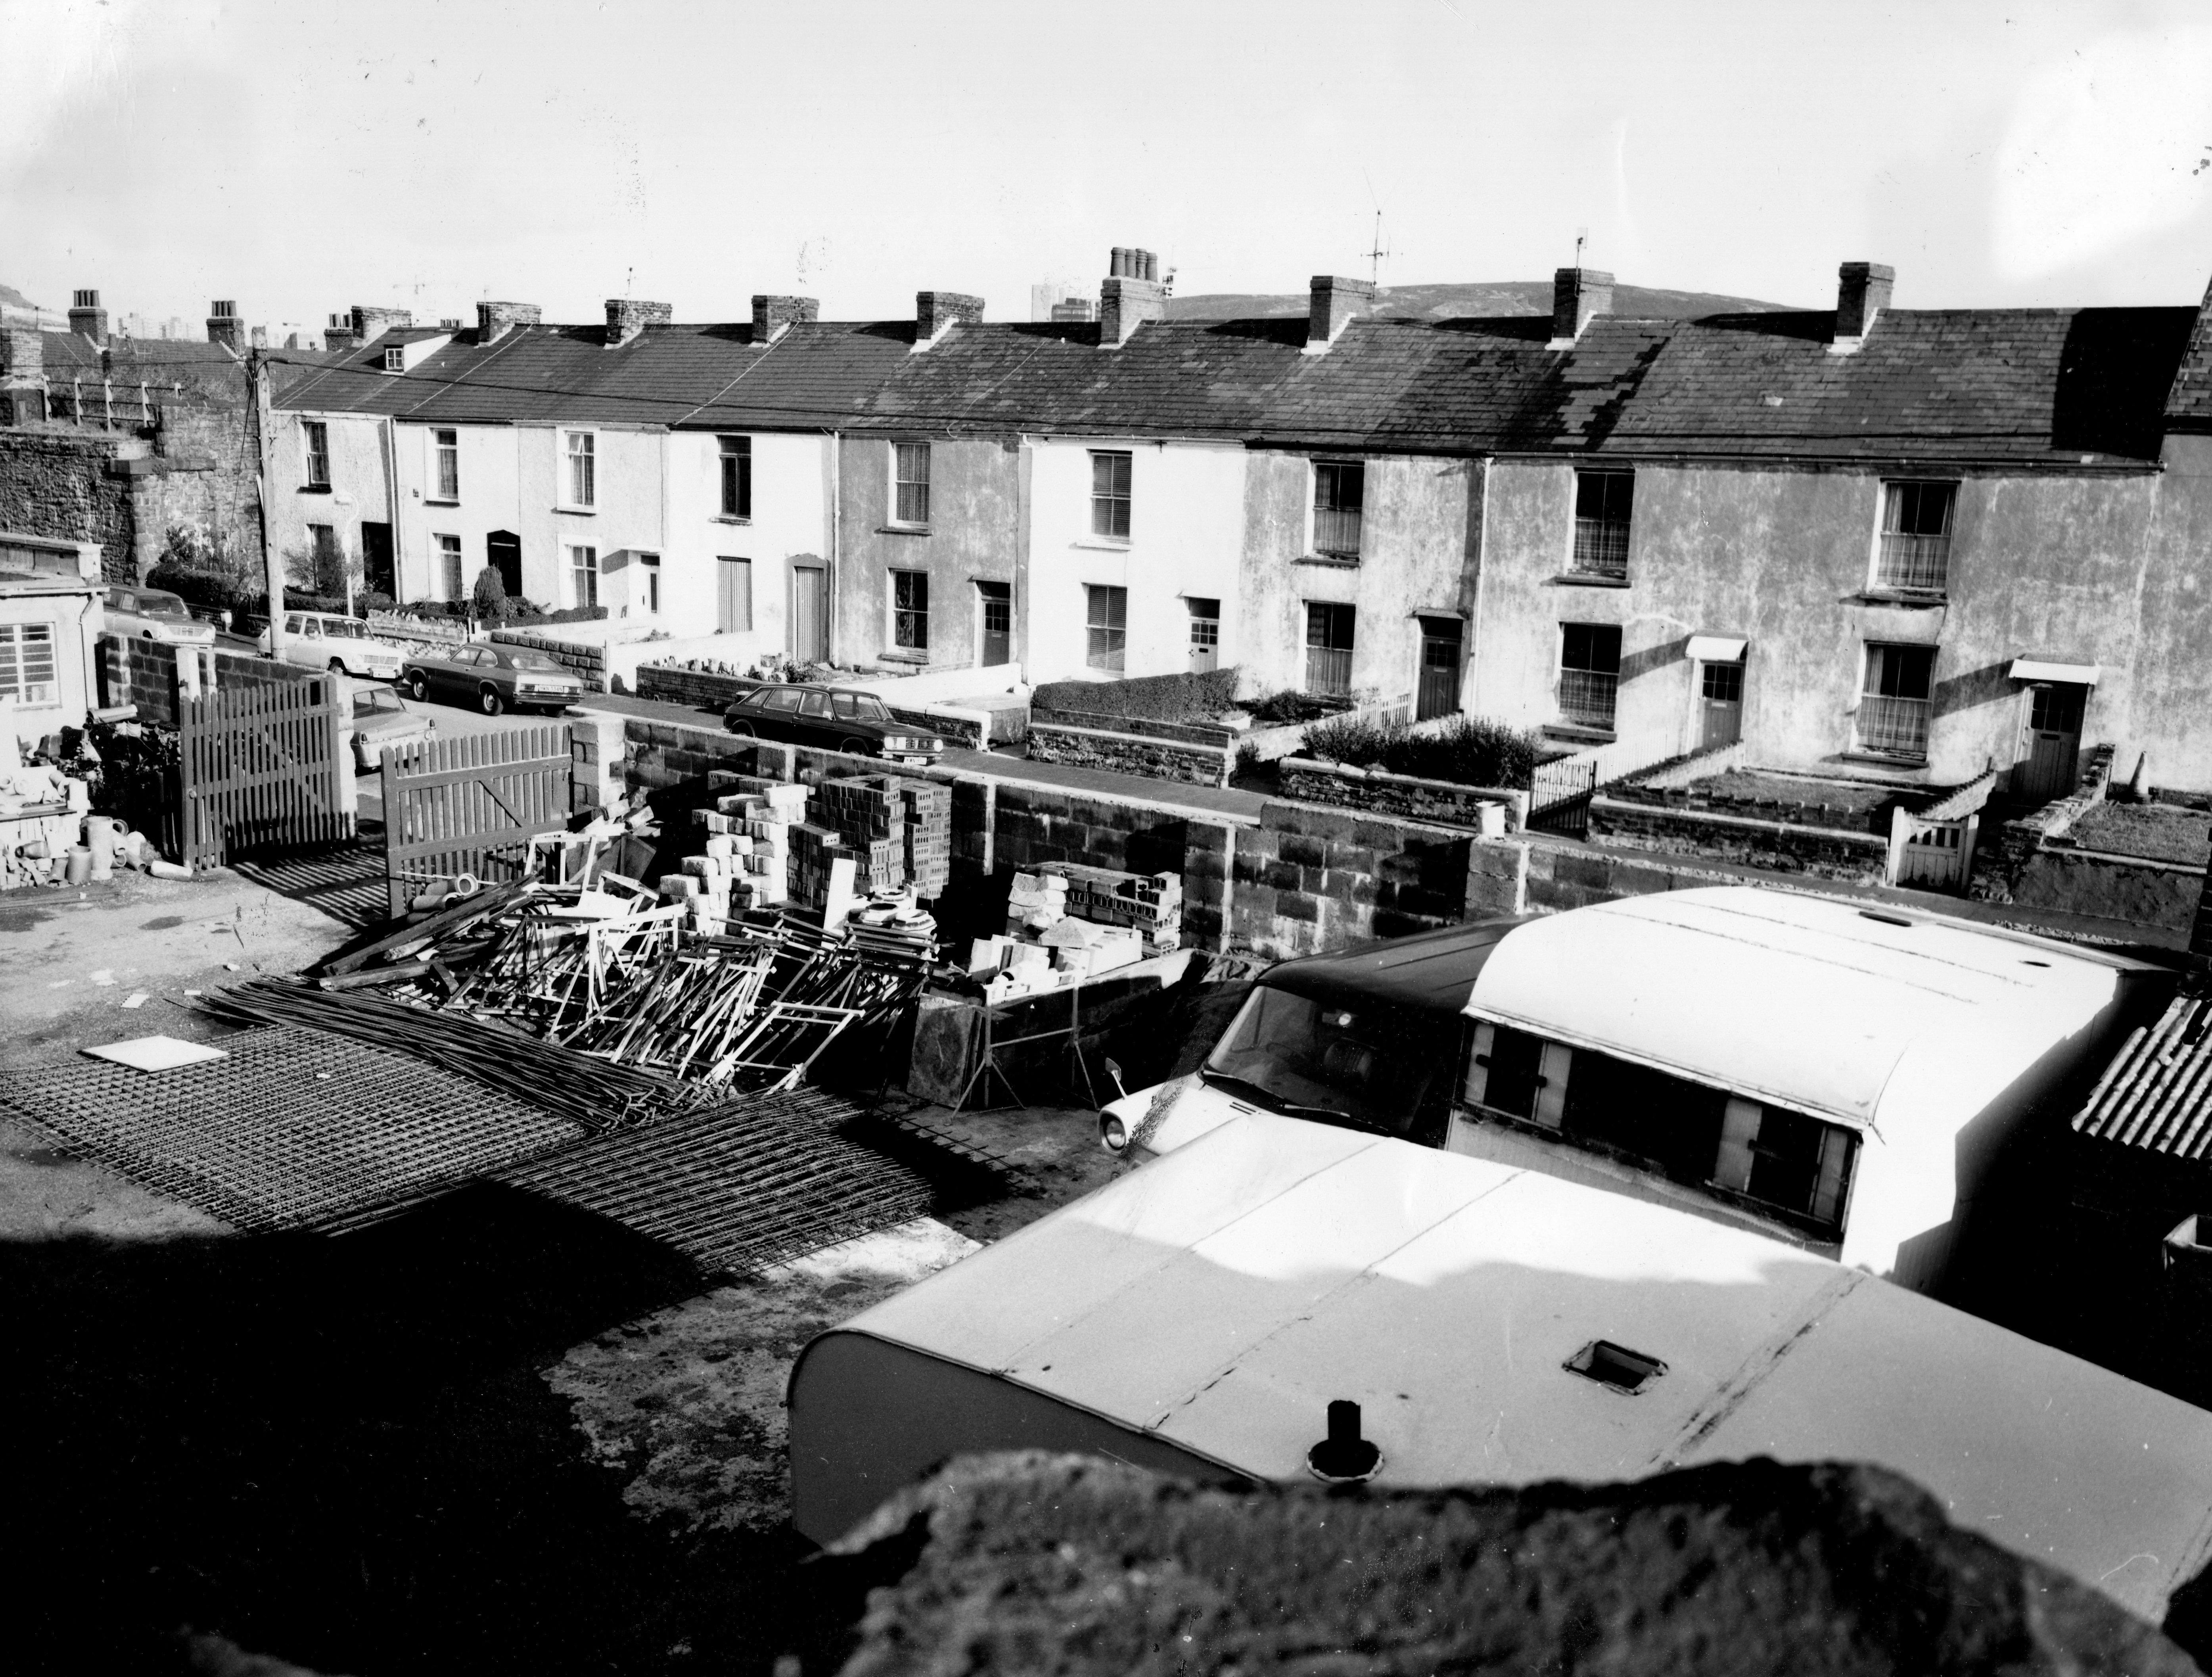 town images swansea recalled. Black Bedroom Furniture Sets. Home Design Ideas